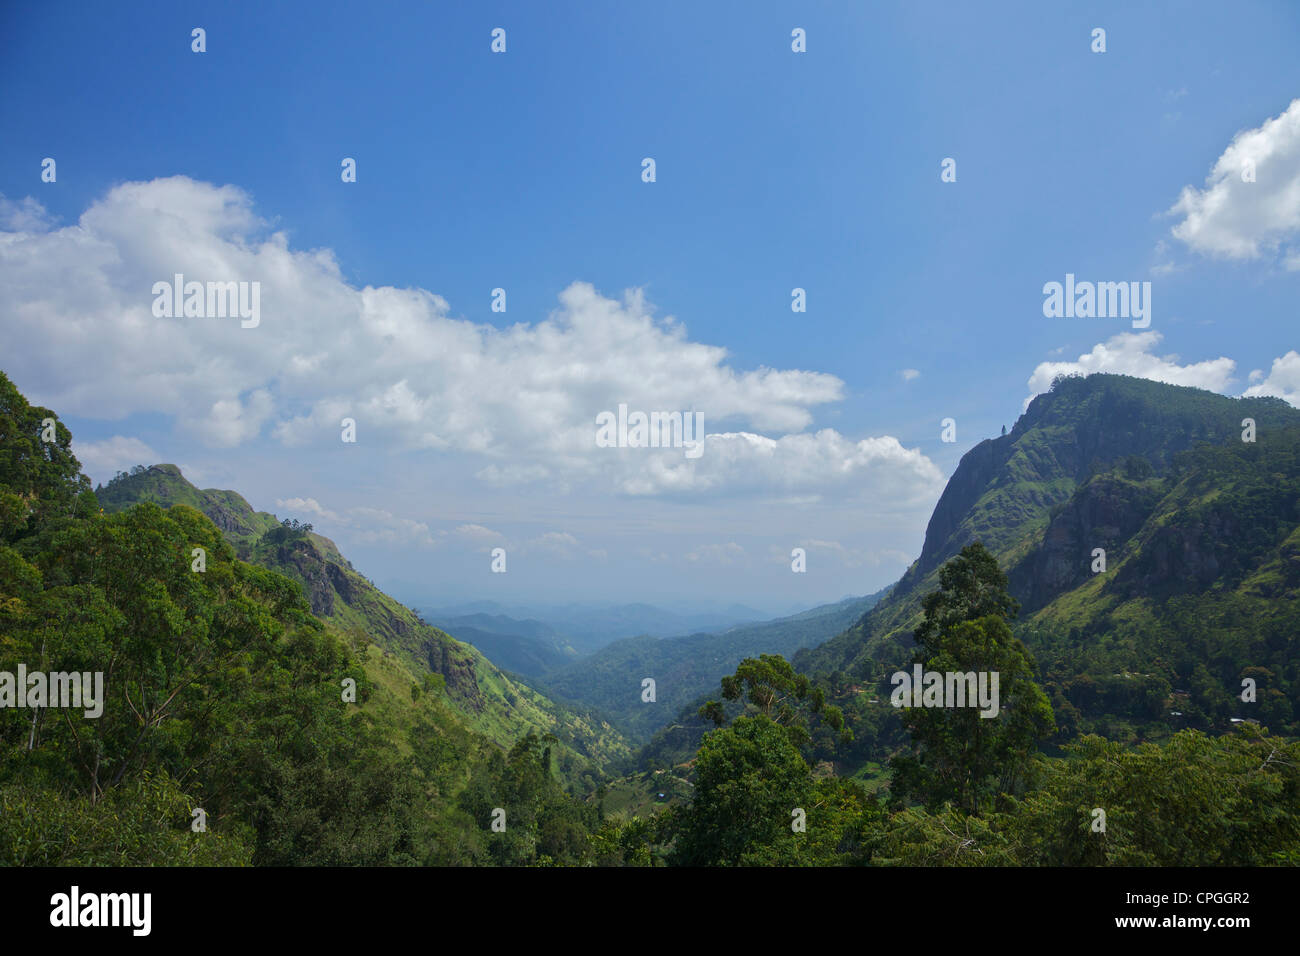 Scenic view of Sri Lankan hill country from Ella Hotel restaurant, Sri Lanka, Asia - Stock Image